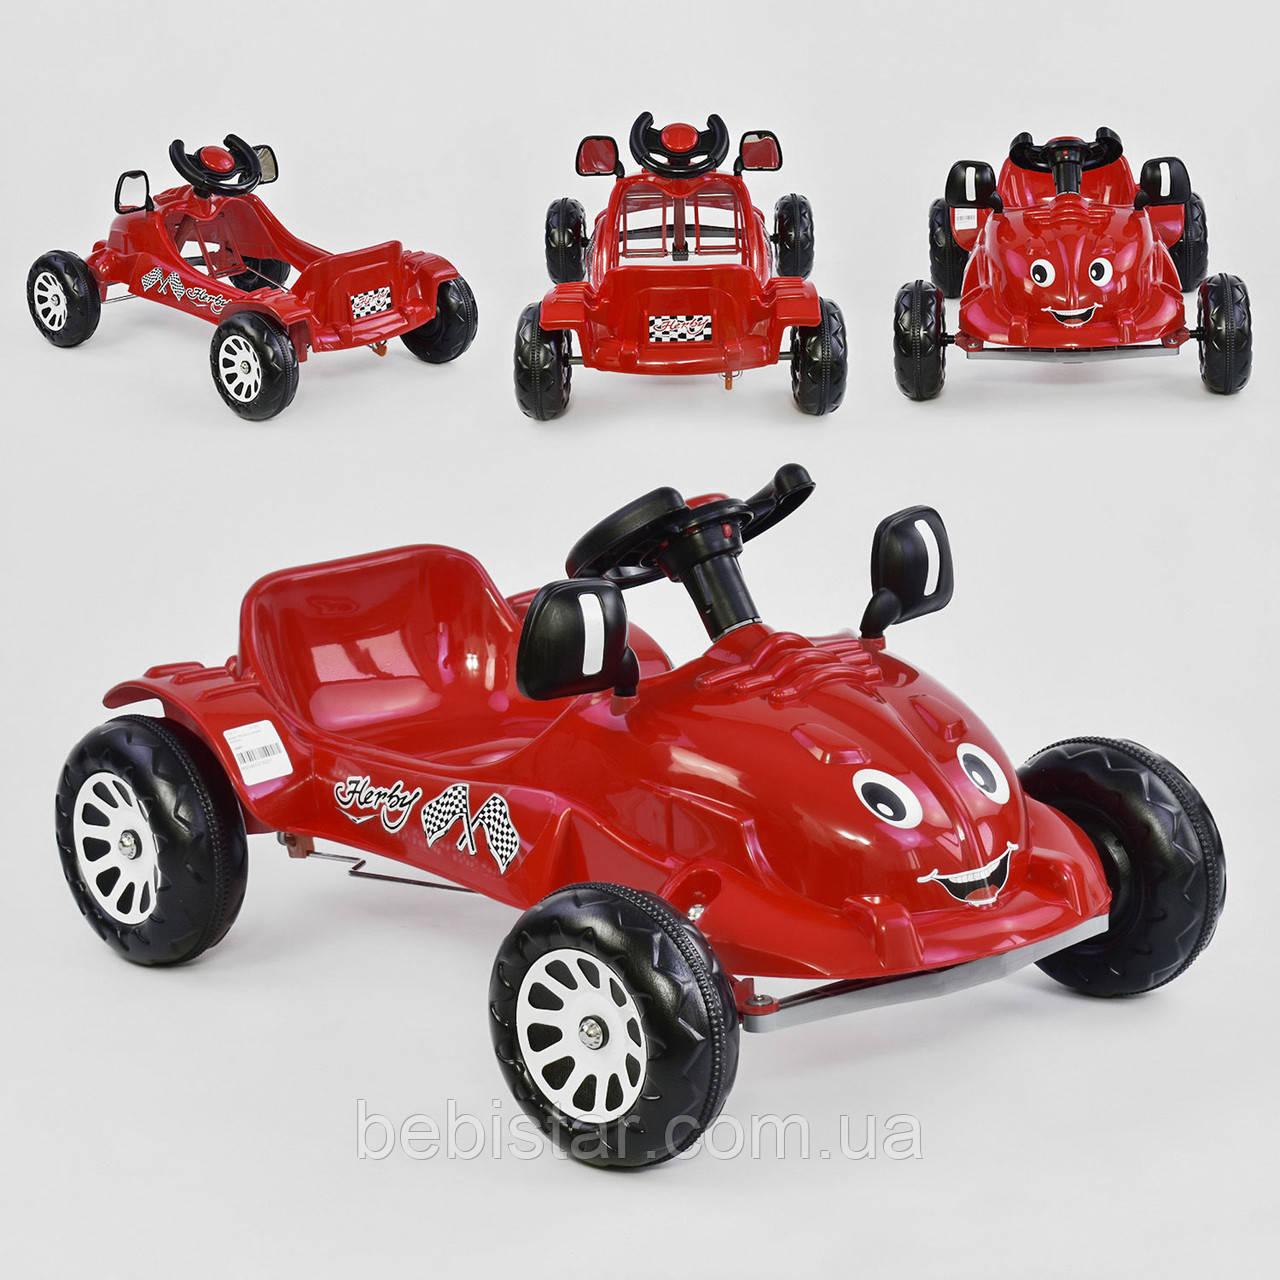 Машина педальная червона, пластикові колеса з звуковим сигналом